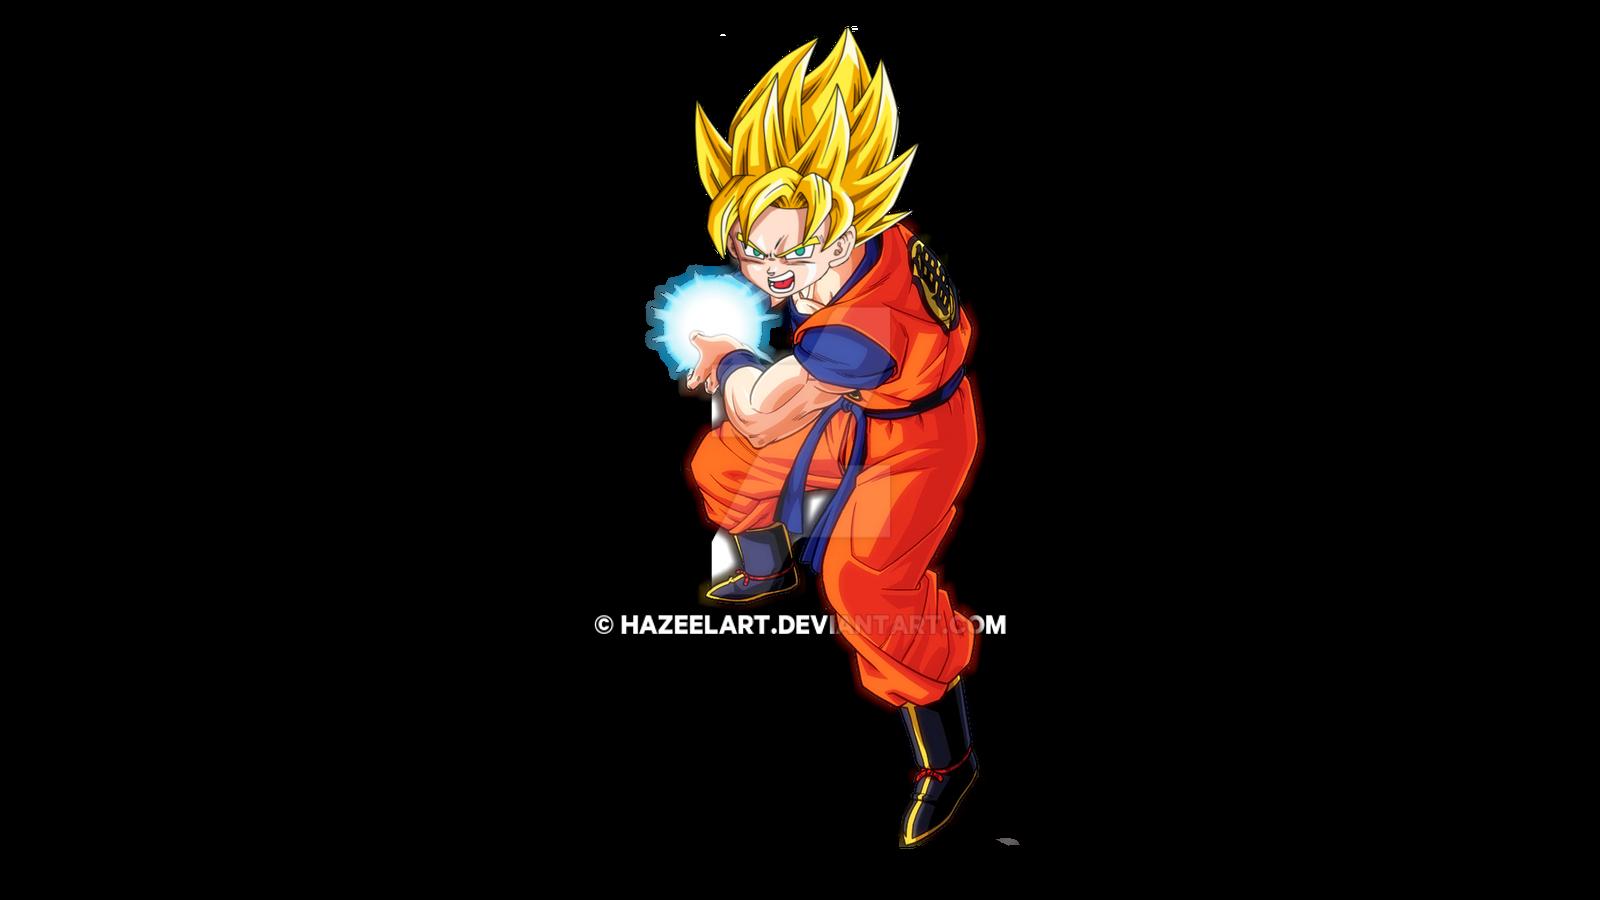 Young Goku Super Saiyan Kamehameha by HazeelArt on DeviantArt